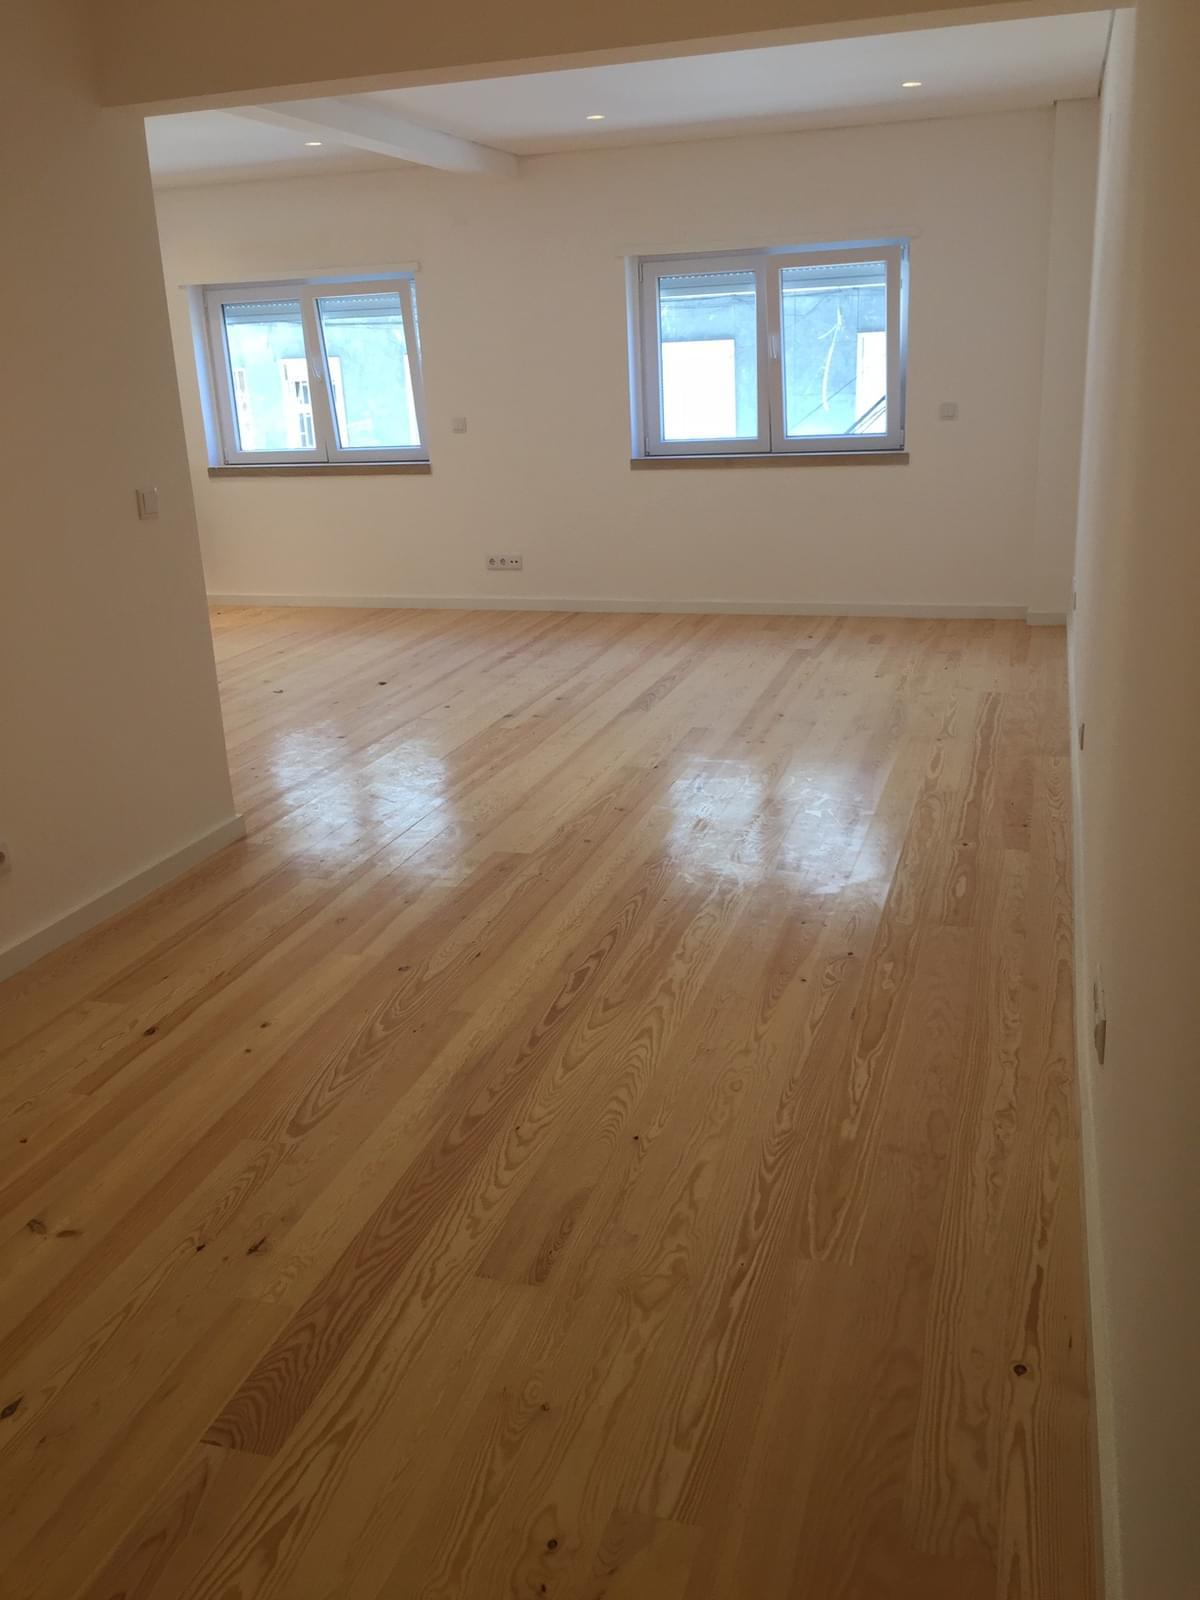 pf18802-apartamento-t1-lisboa-eaff5005-8653-4bea-9c16-1b32916276c5